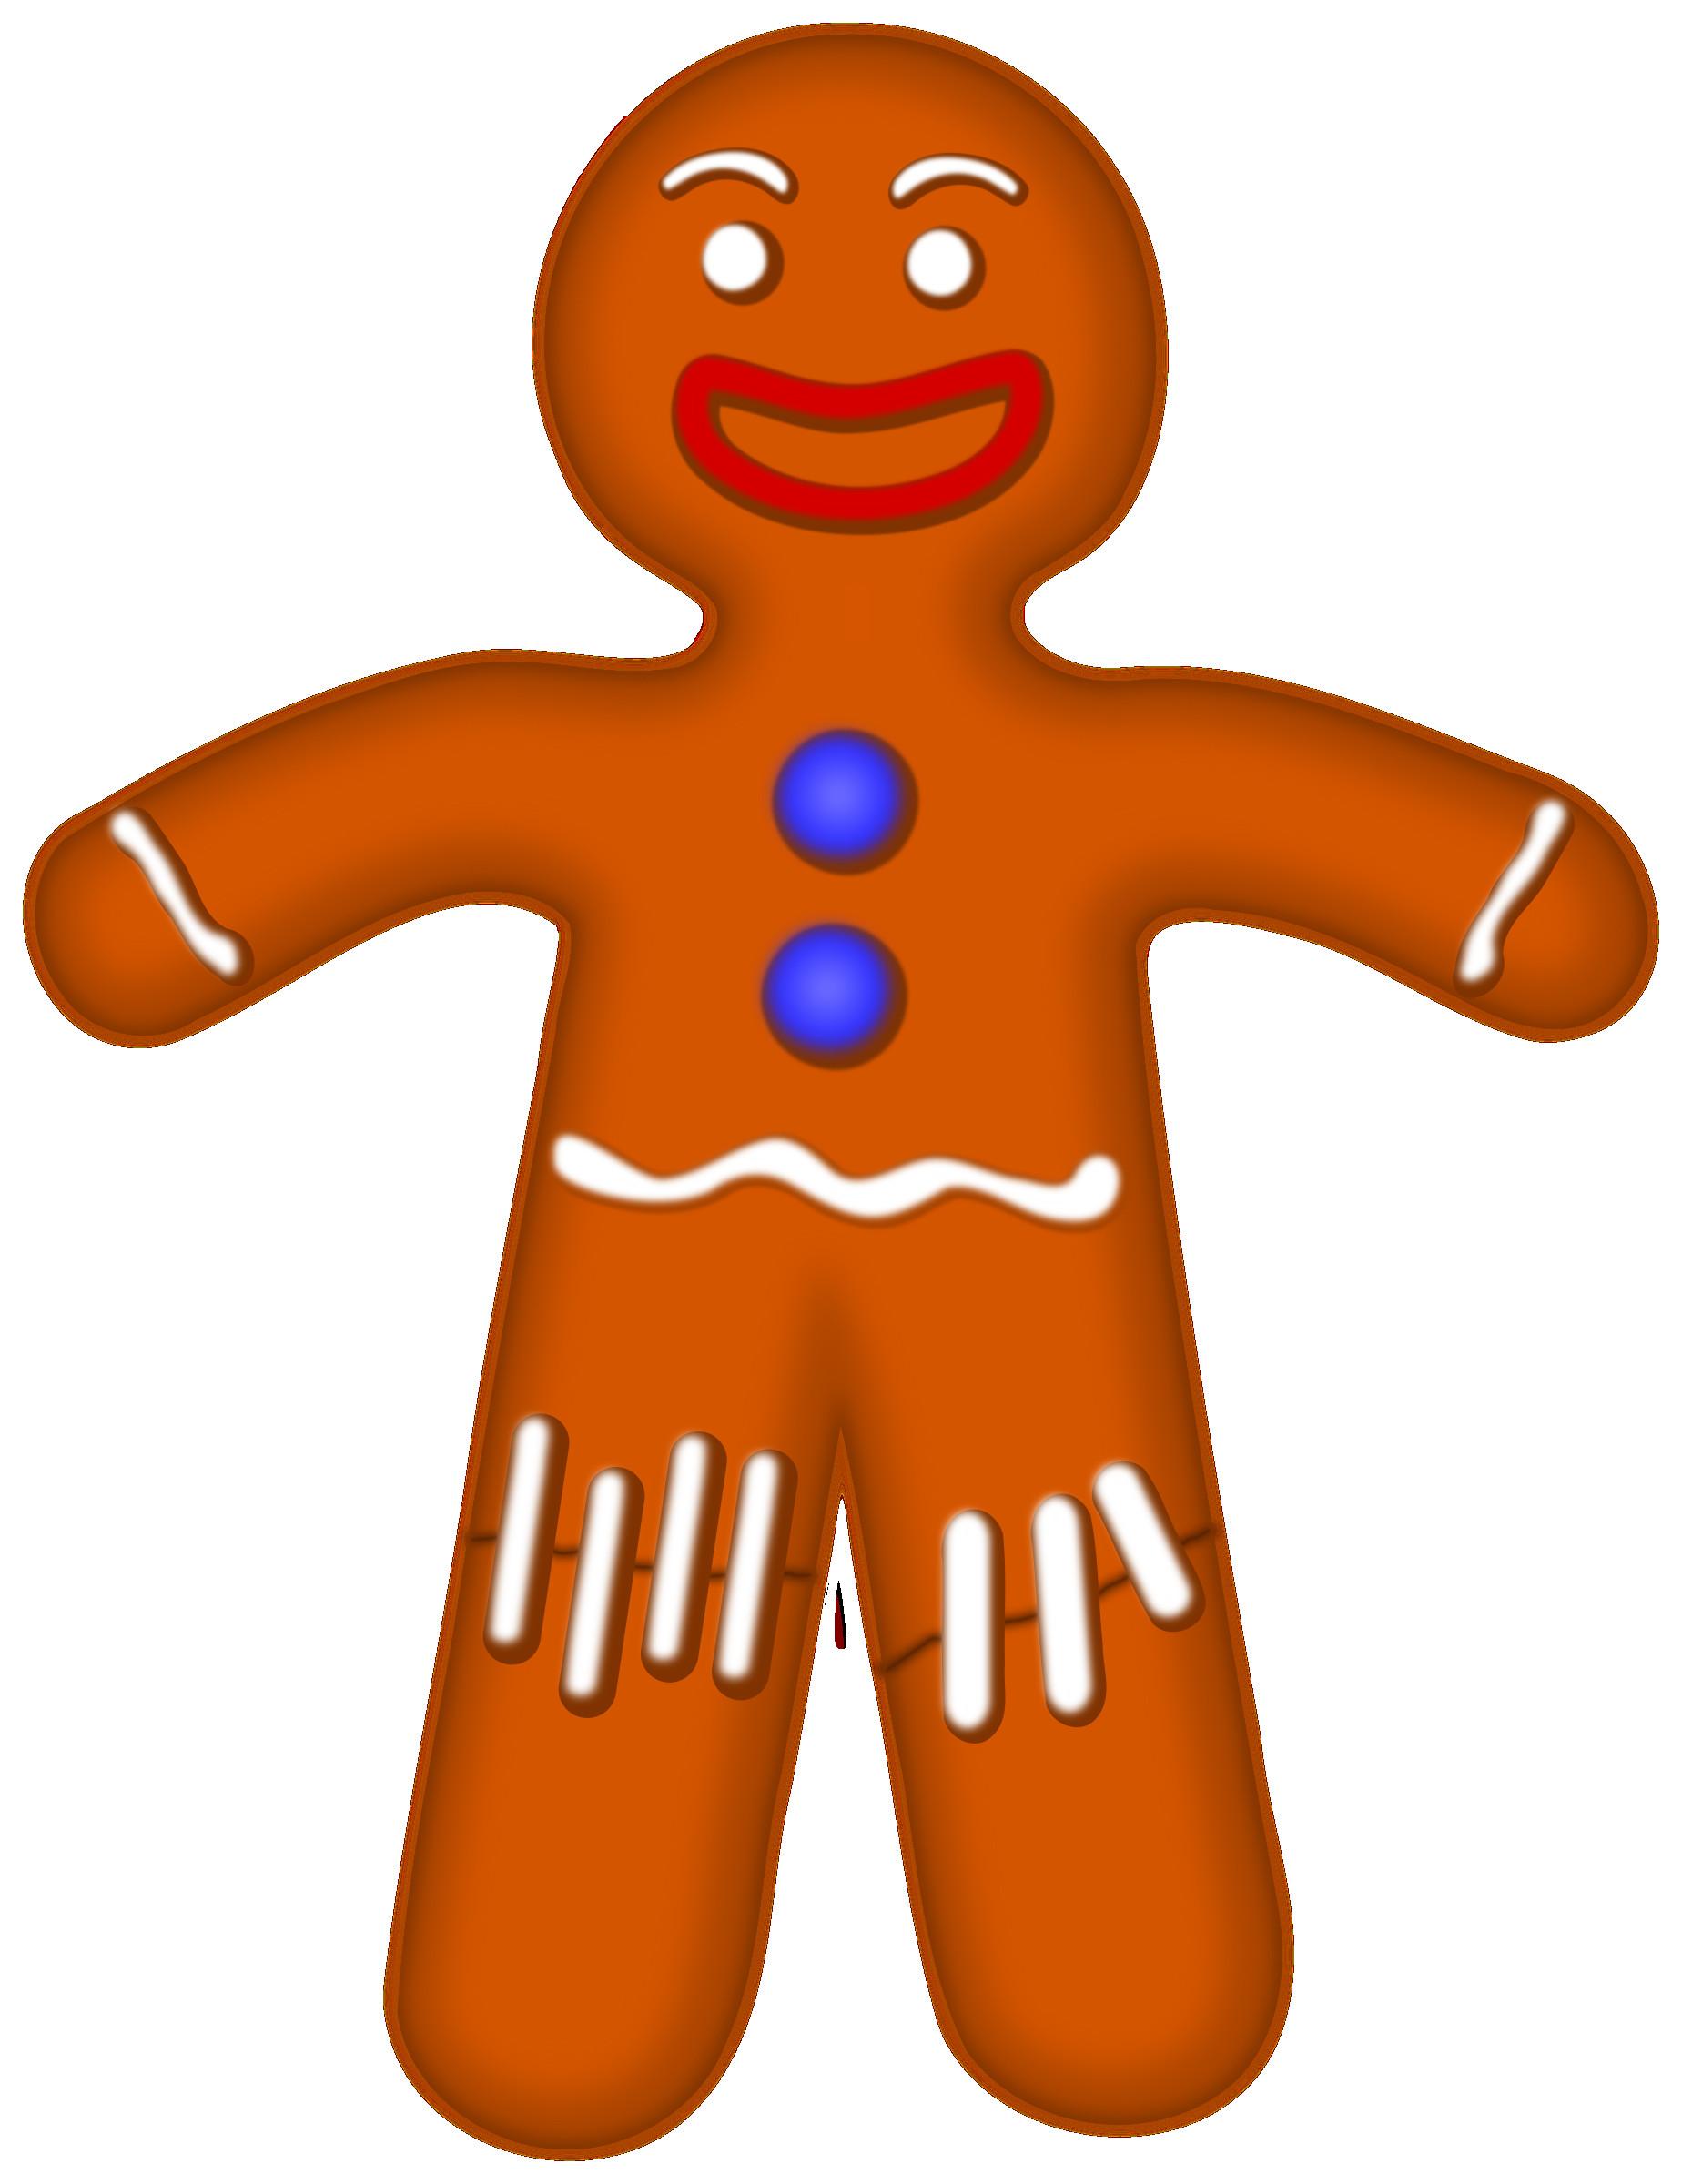 1848x2400 Gingerbread Man Clipart Scrapbook Printables Holiday Clip Art